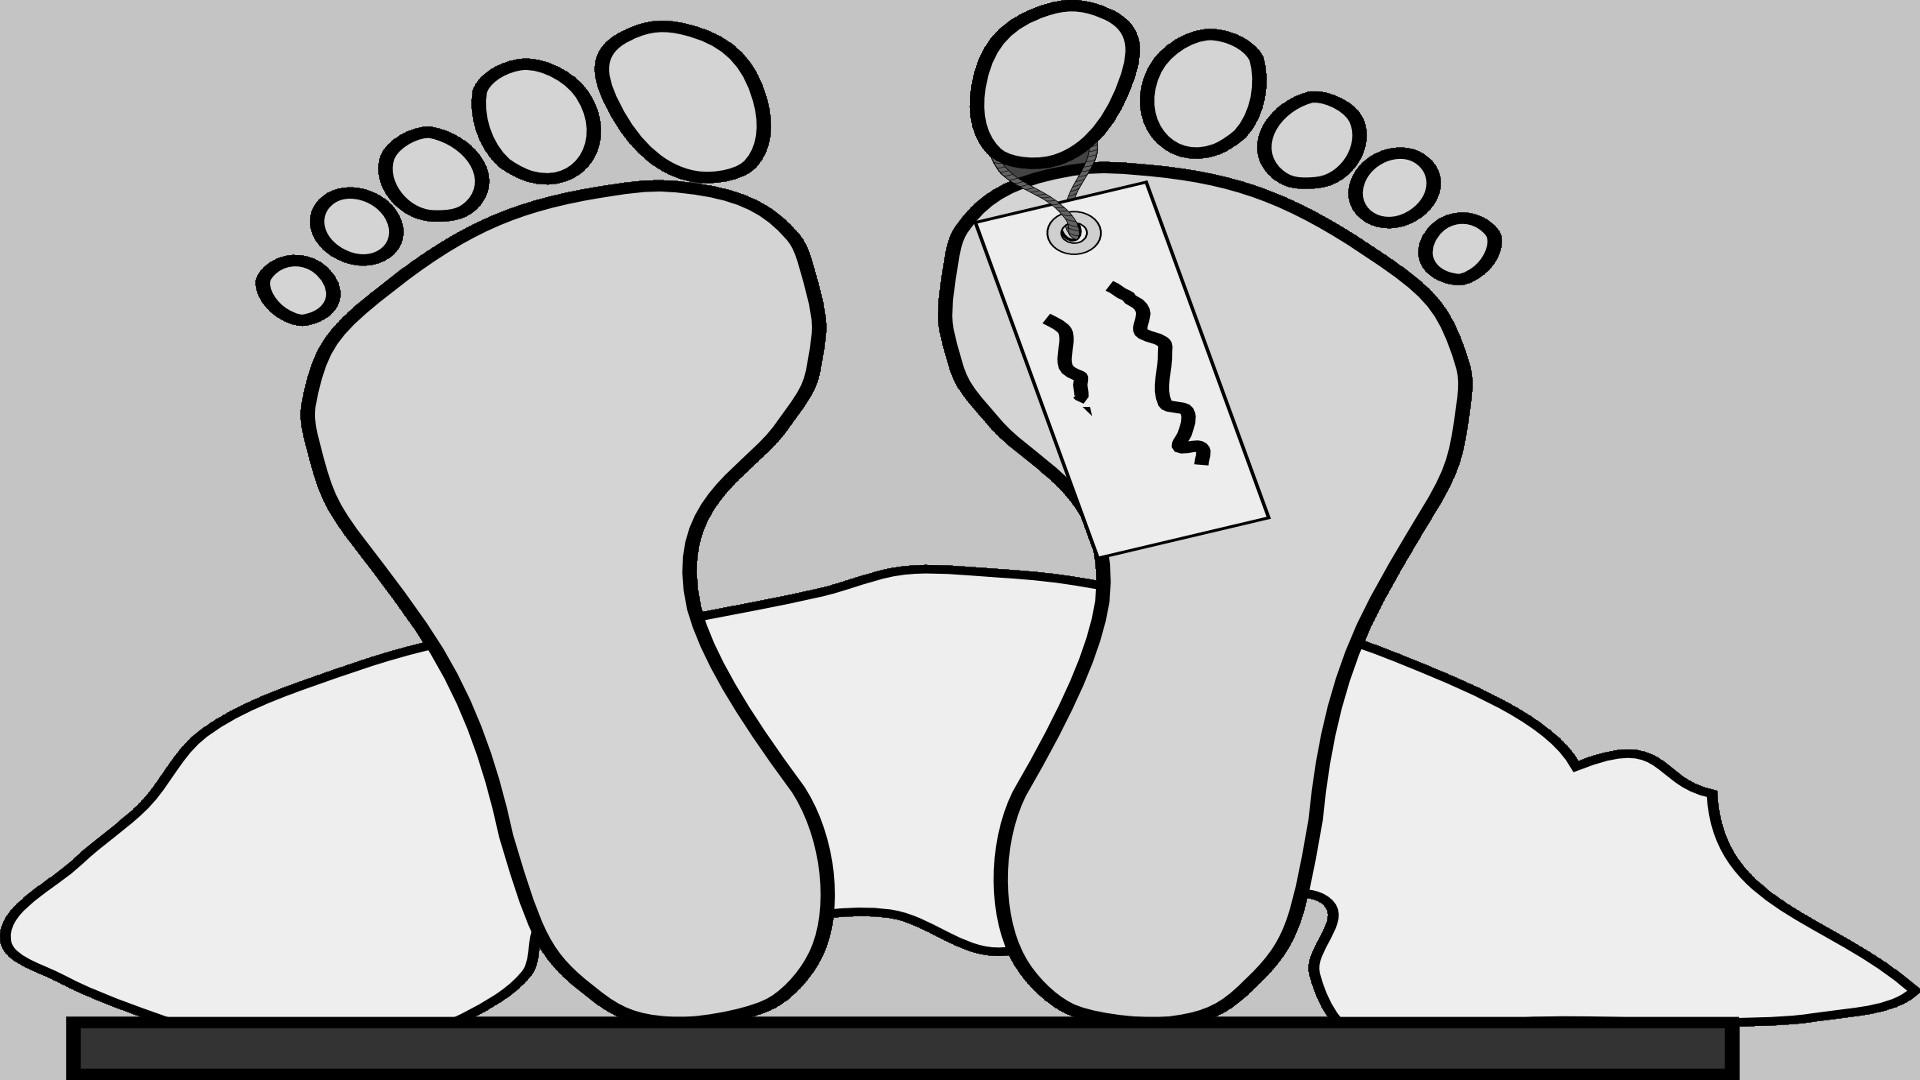 La autopsia tambien llamada examen post mortem o necropsia 1920